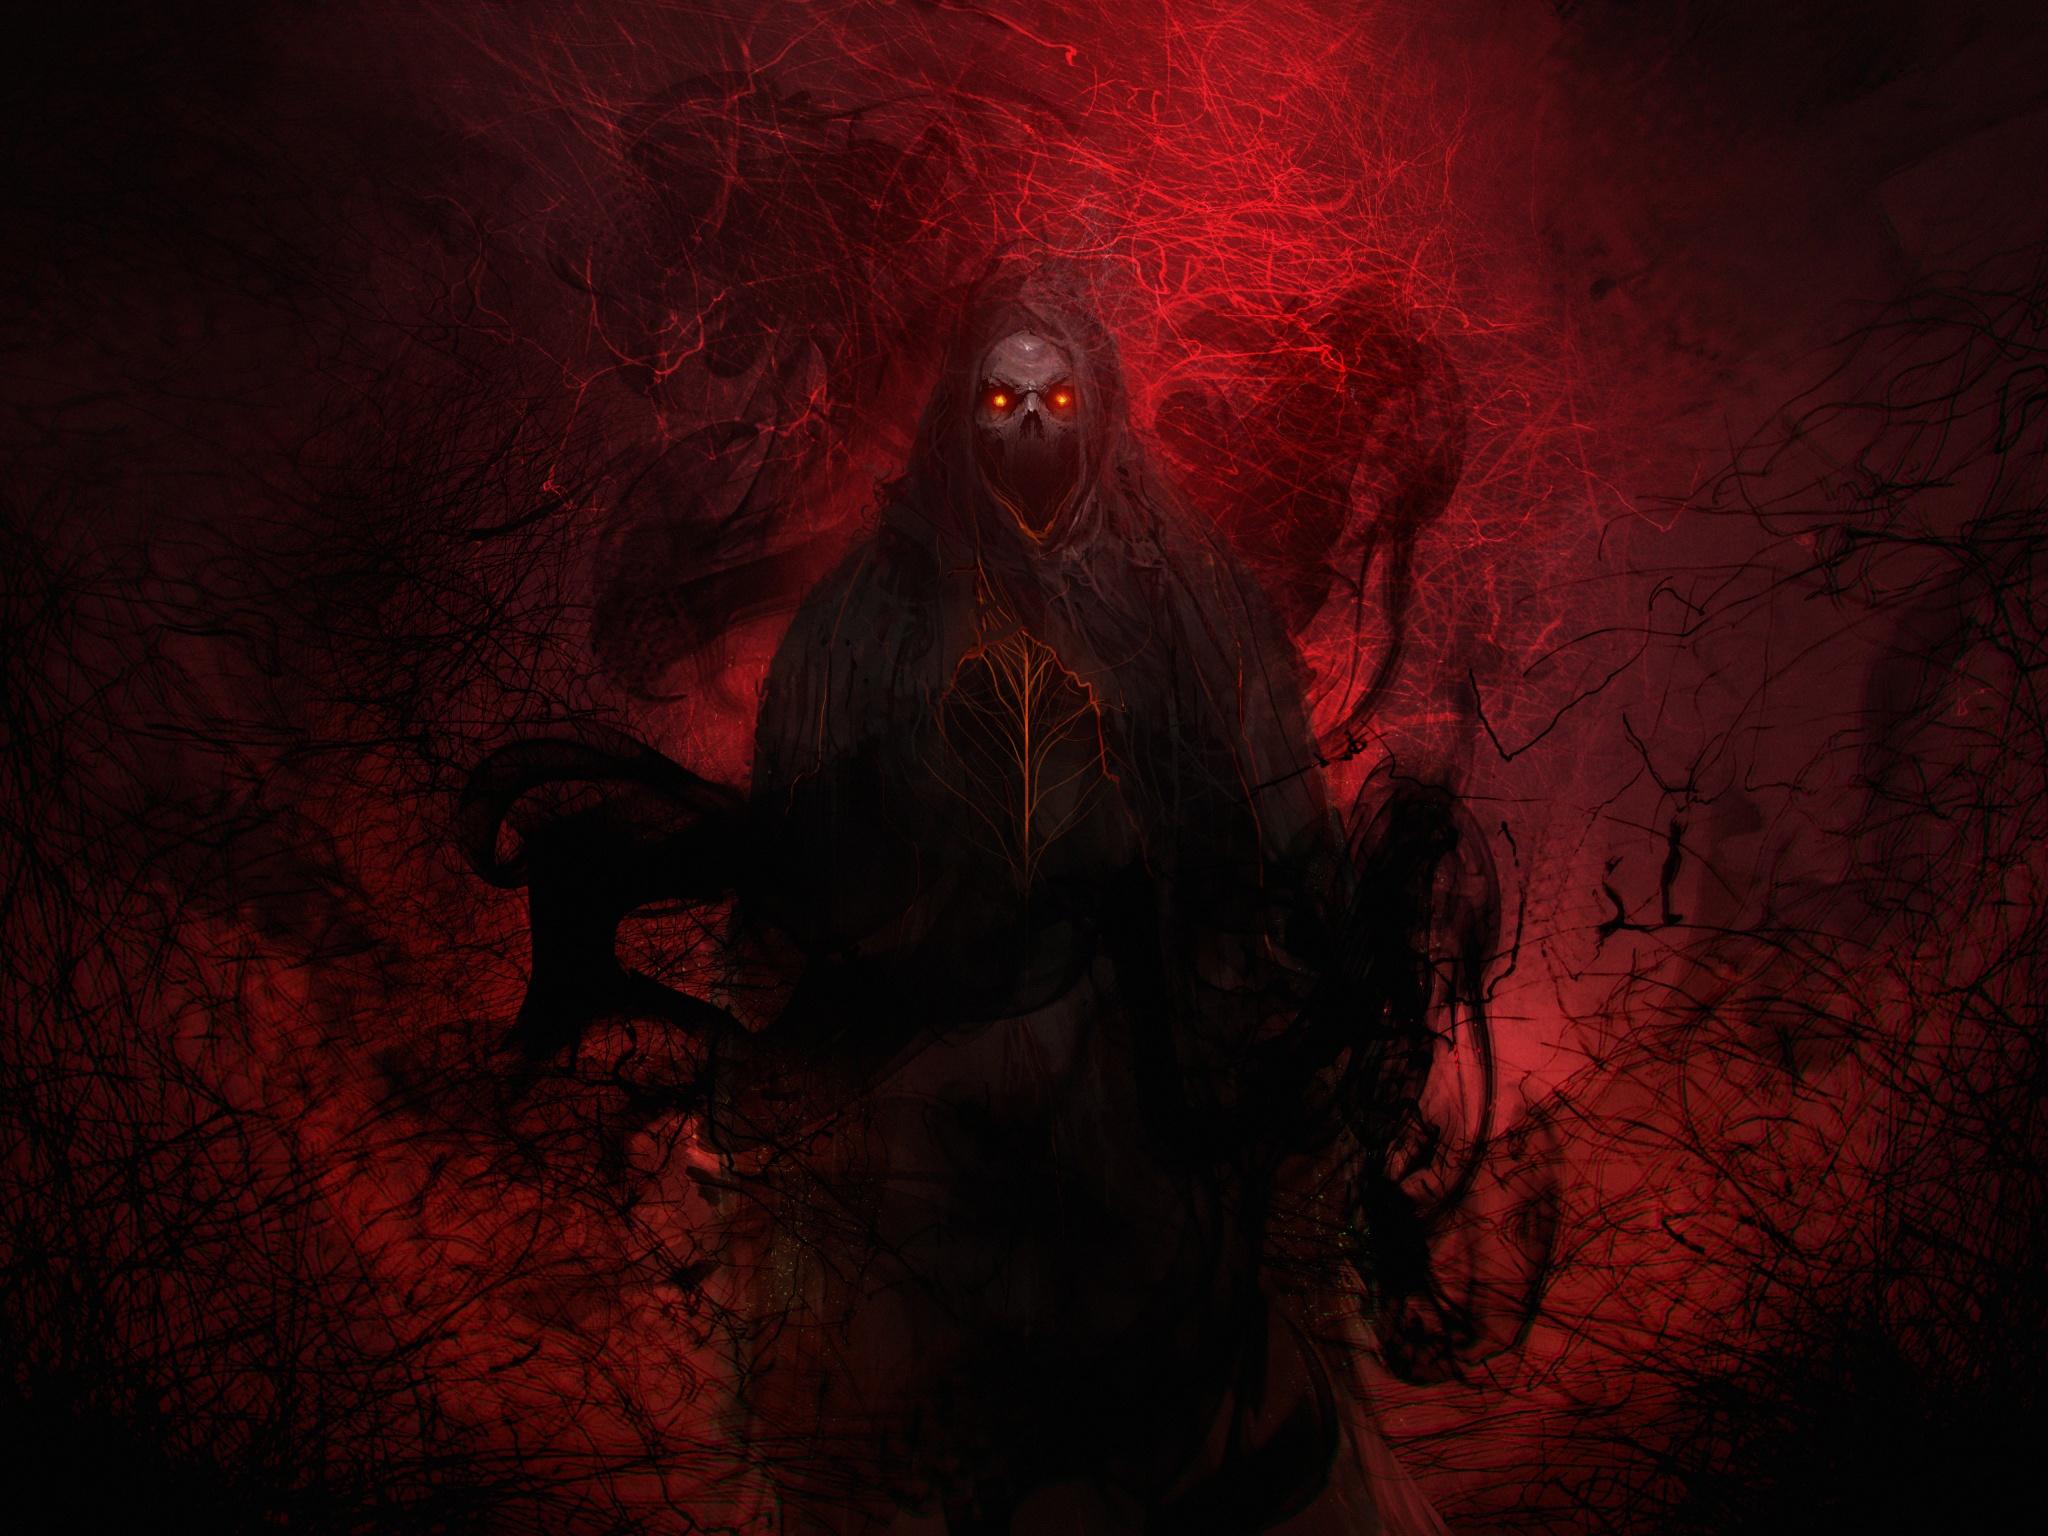 hell devil horror death reaper grim satan scary demon eyes wallpapers 4k dark welcome 5k fantasy 1080p cgi graphics deviantart